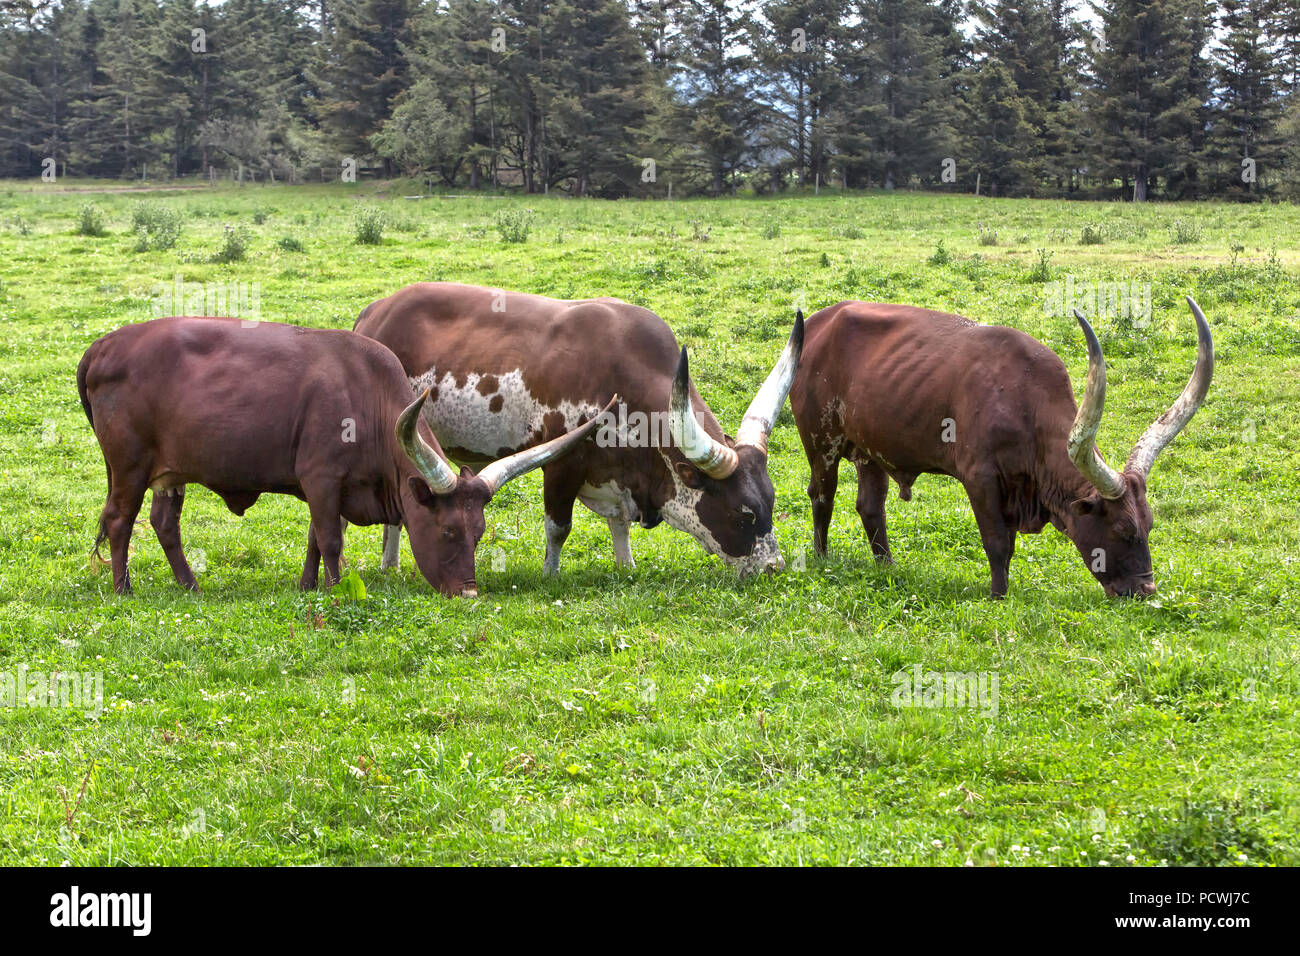 Ankole-Watusi cattle  'Bos taurus'  grazing side by side, green pasture, California. - Stock Image